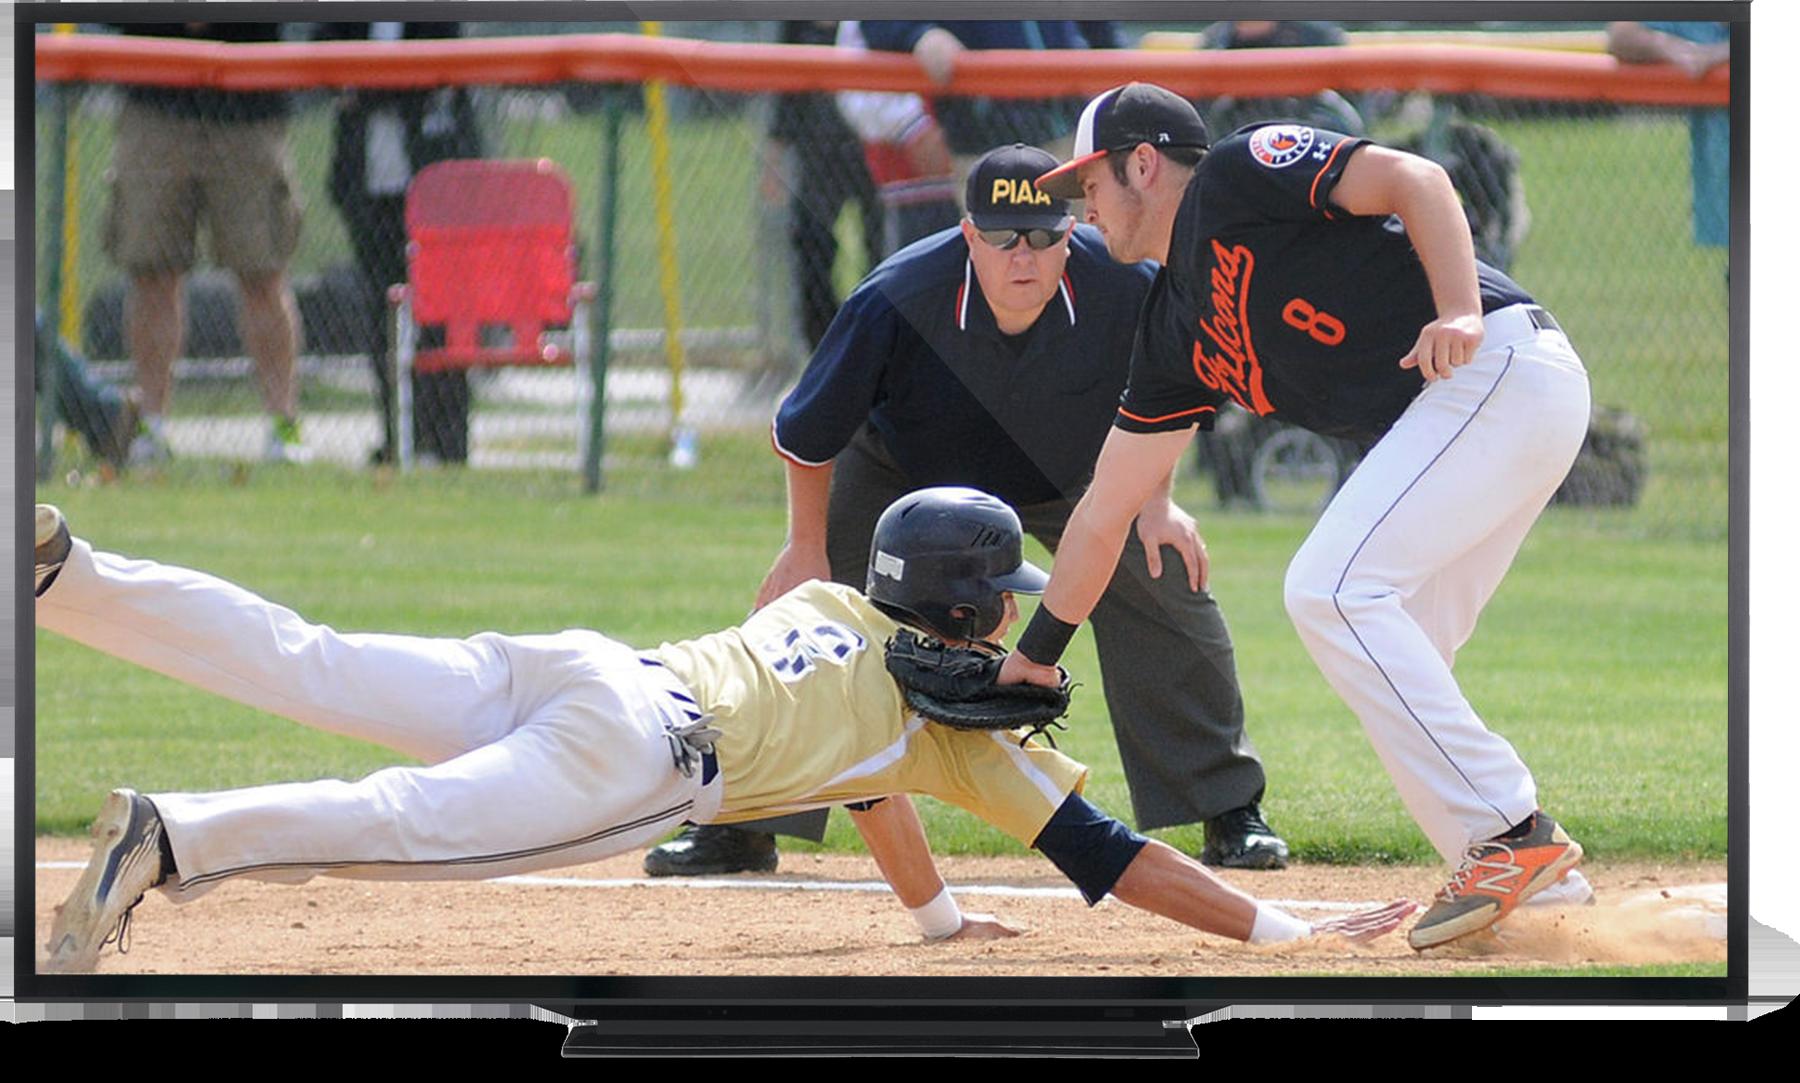 Watch Pennsbury High School baseball live on WBCB Sports